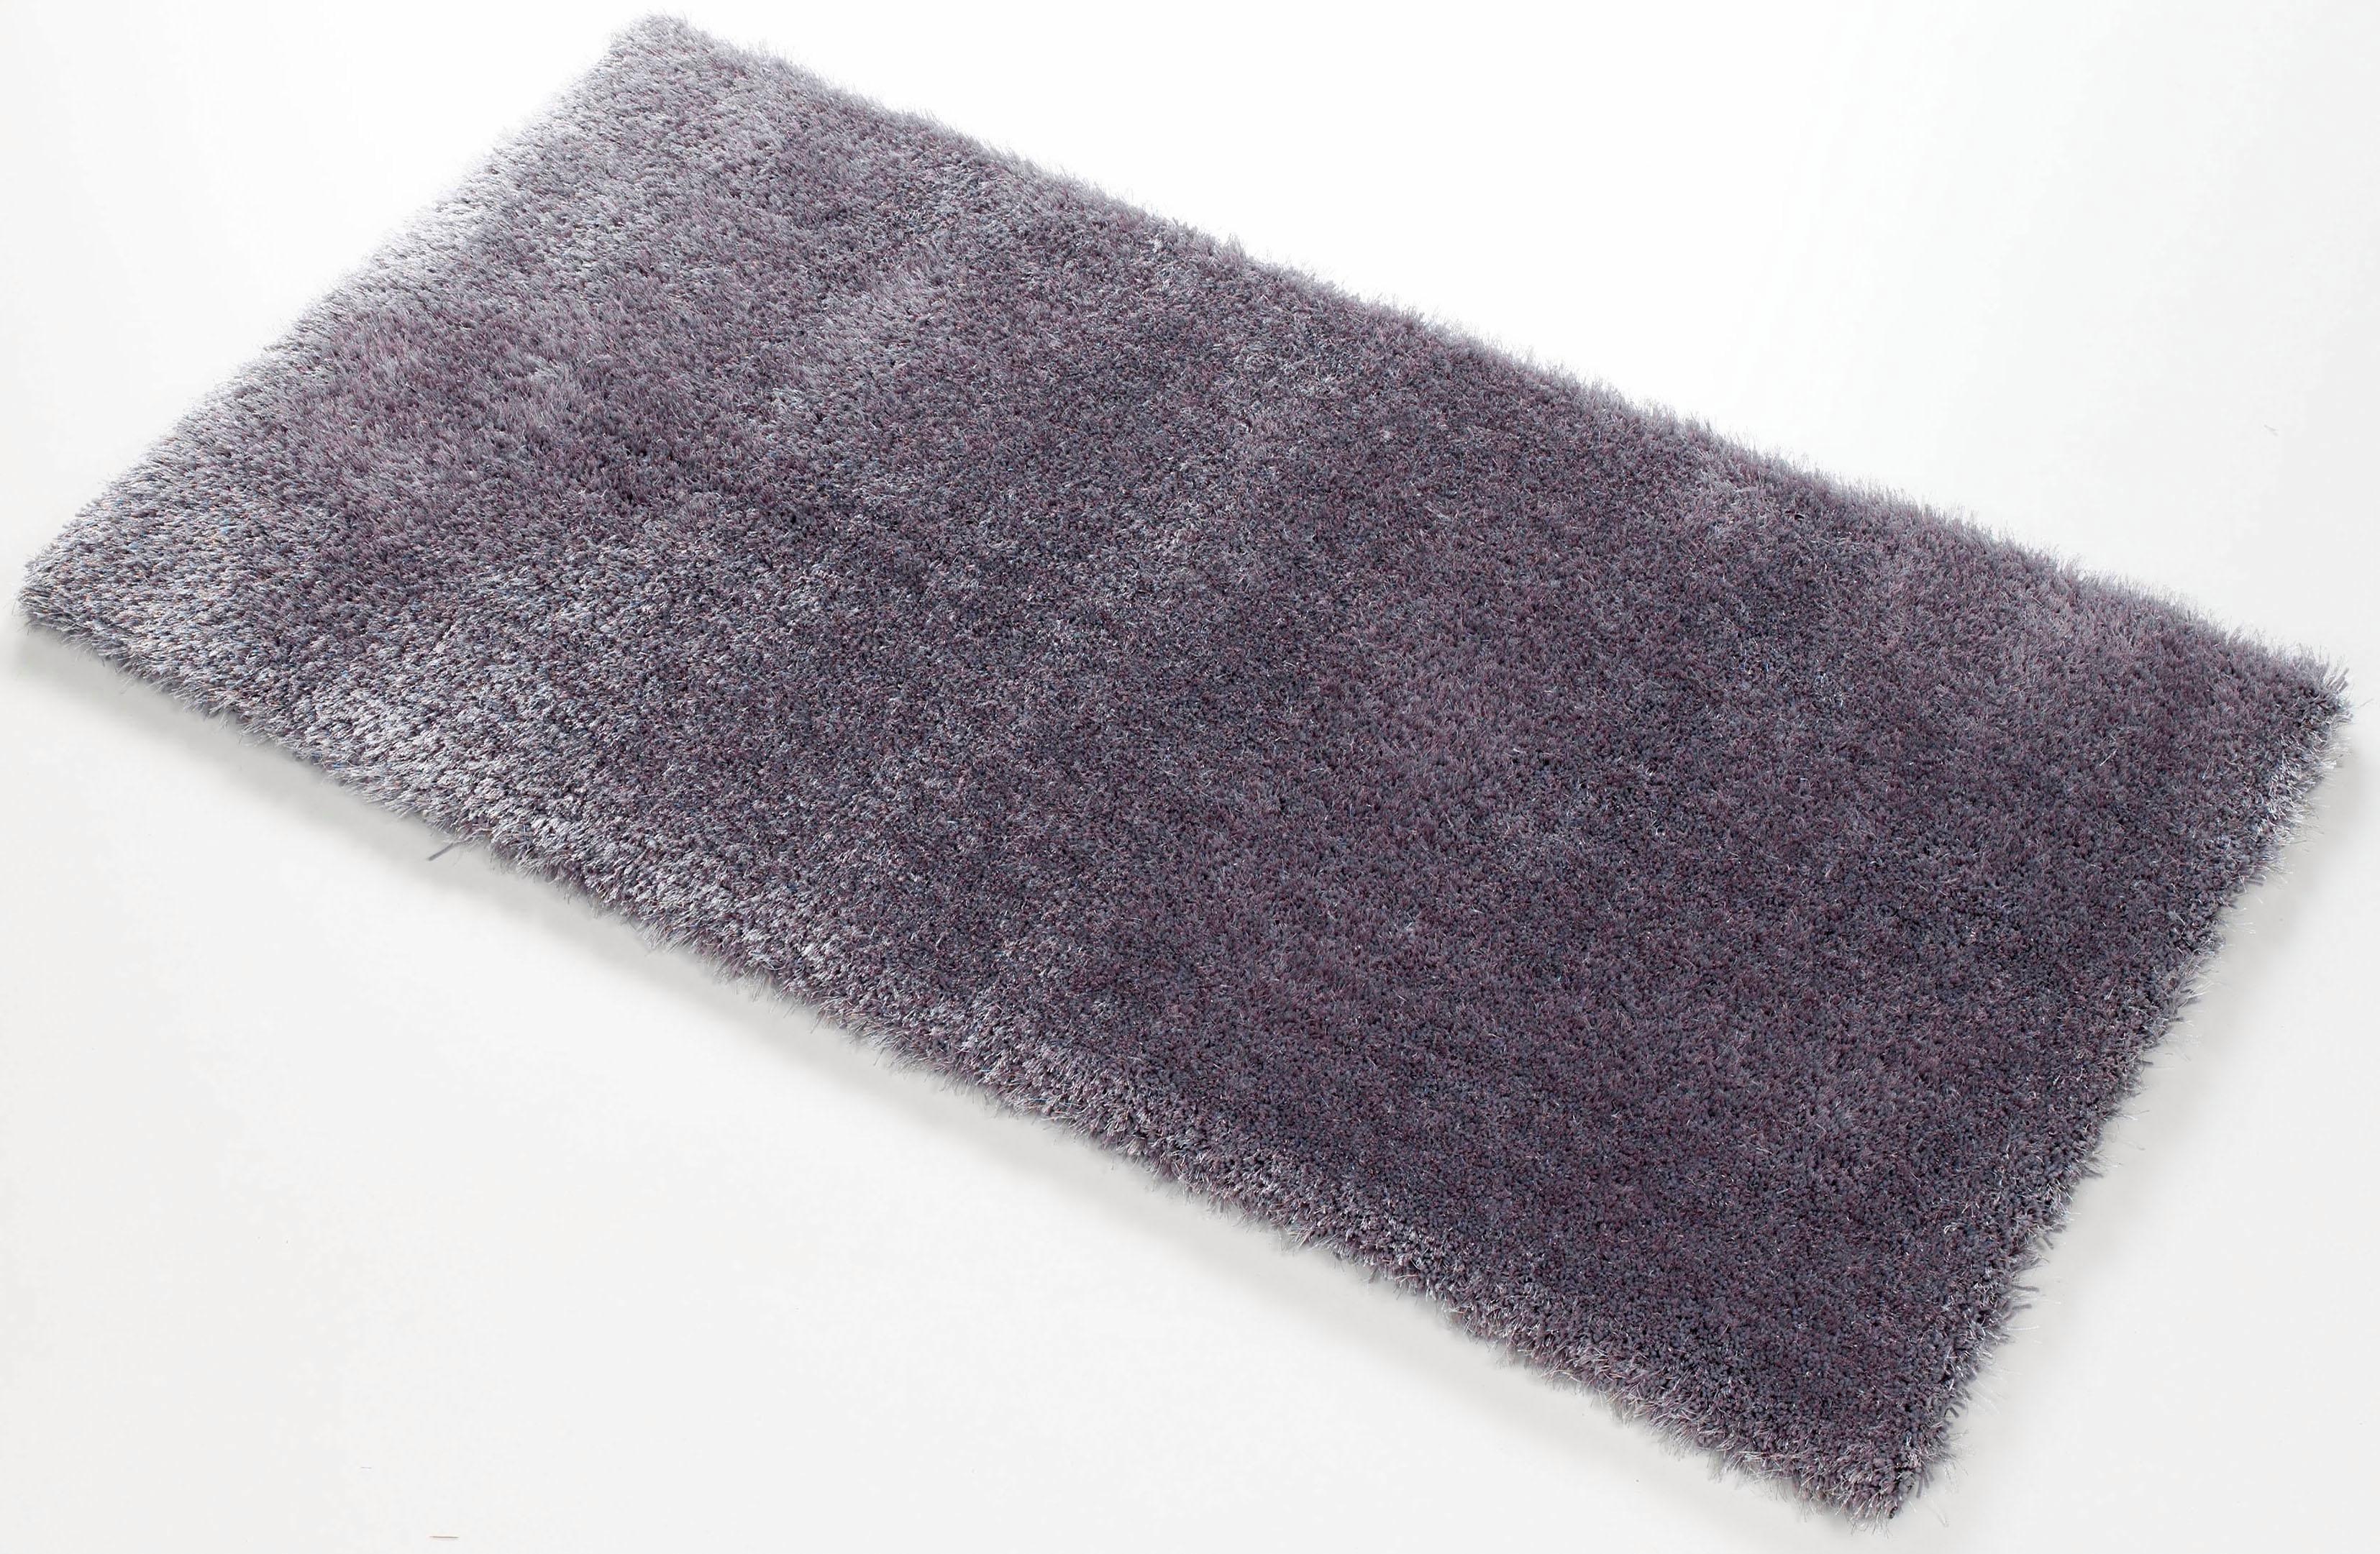 Hochflor-Teppich KiYou Shaggy KiYou Shaggy rechteckig Höhe 40 mm handgetuftet